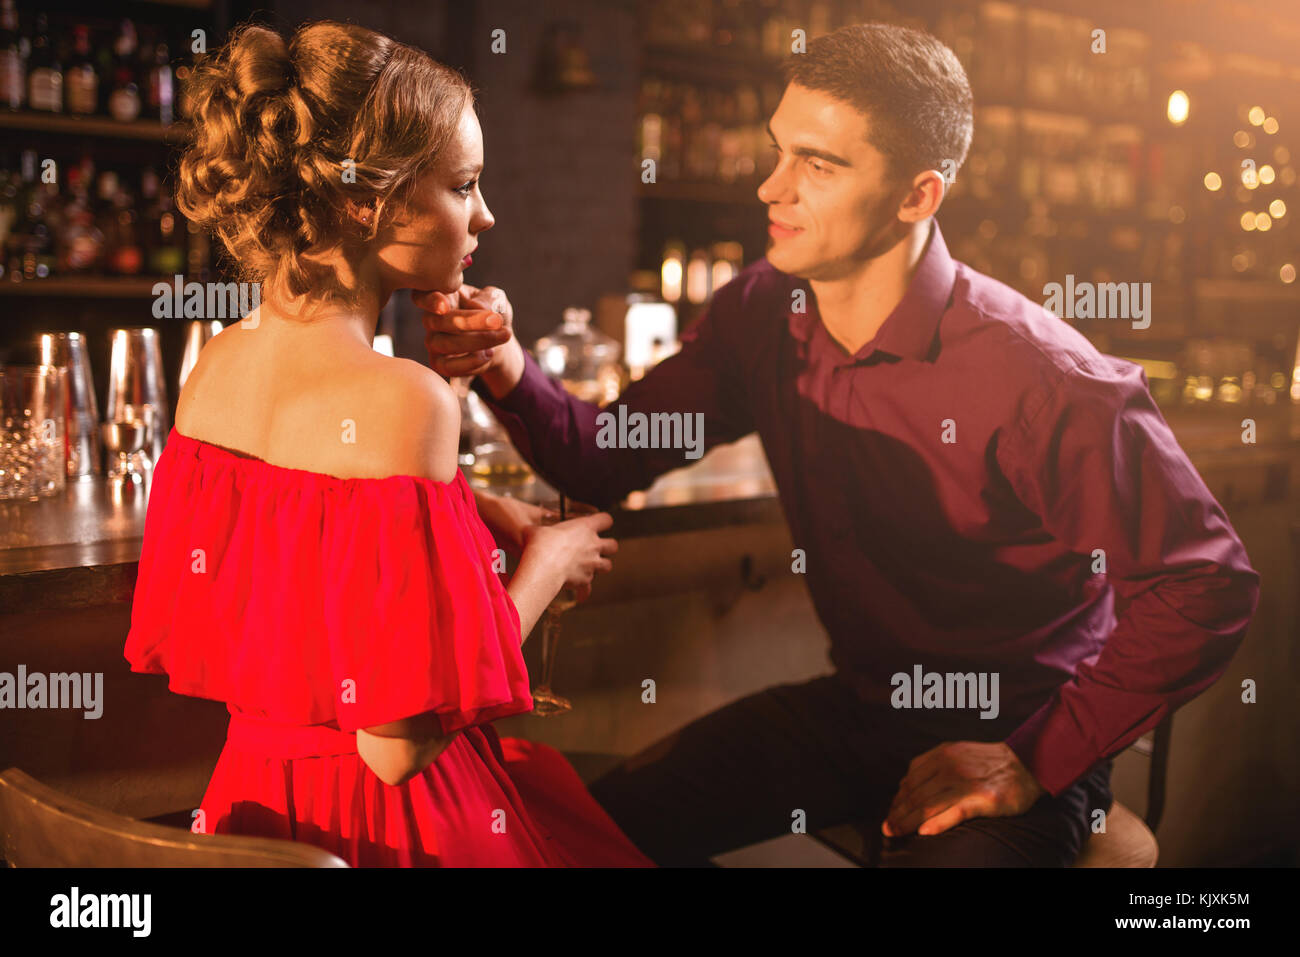 Dating weniger gebildeter Mensch randki w ciemno blind dating lektor pl